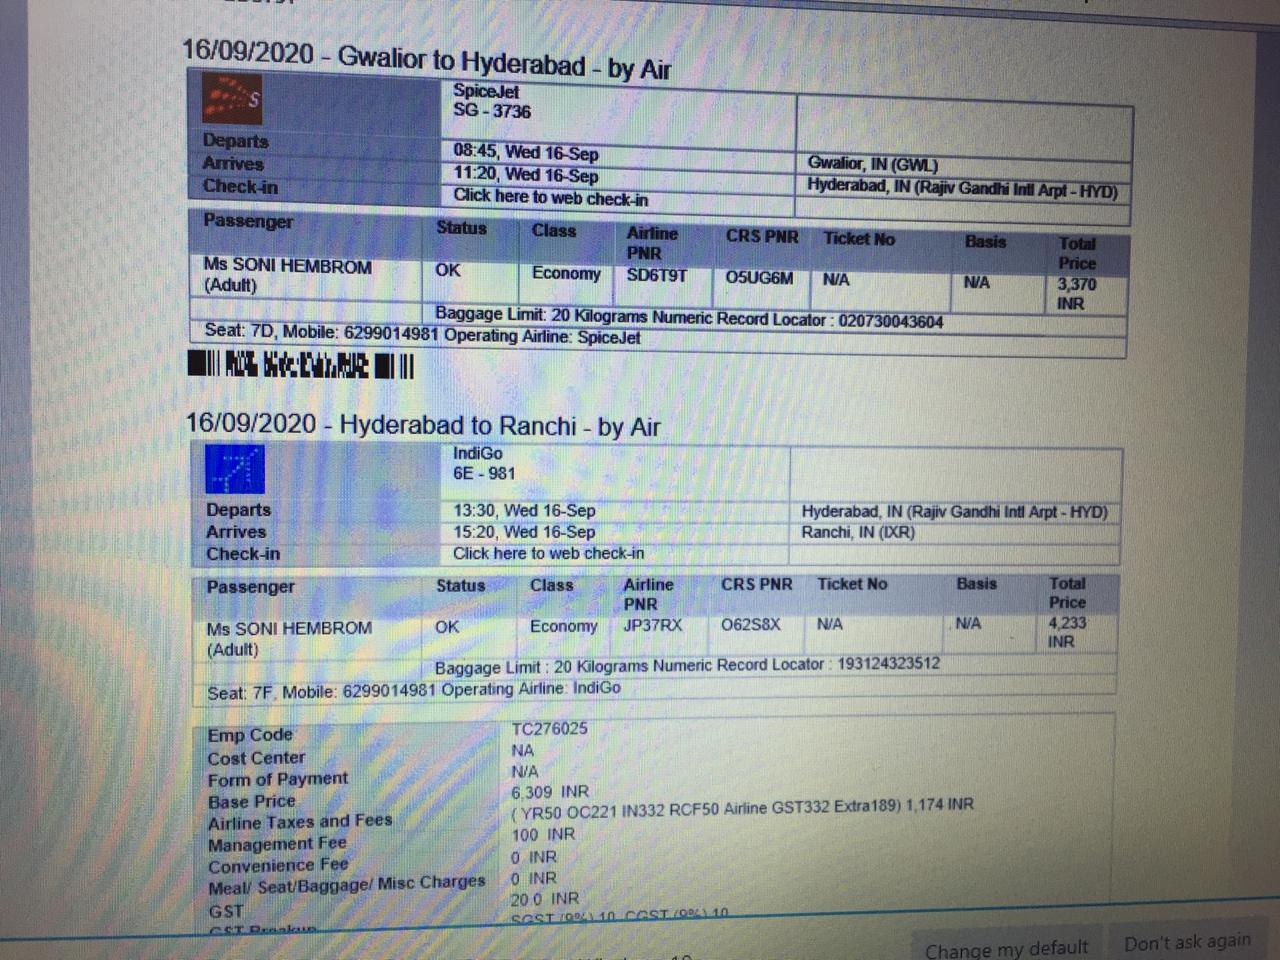 सोनी हम्बर का हवाई टिकट।